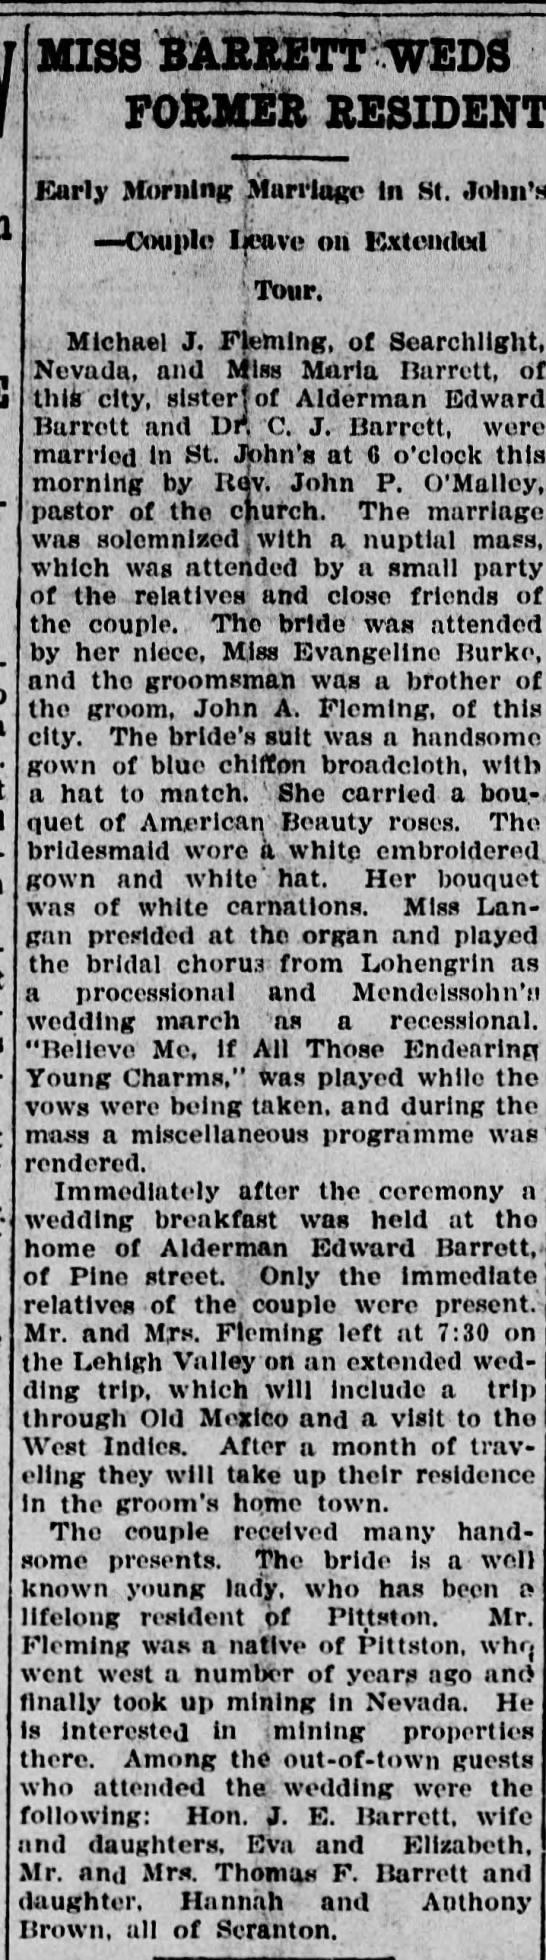 Maria Barrett wedding to Michael Fleming; Pittston Gazette; 3 October 1906 - - - ' I MISS BARRETT WED FOilUER RESIDENT I...